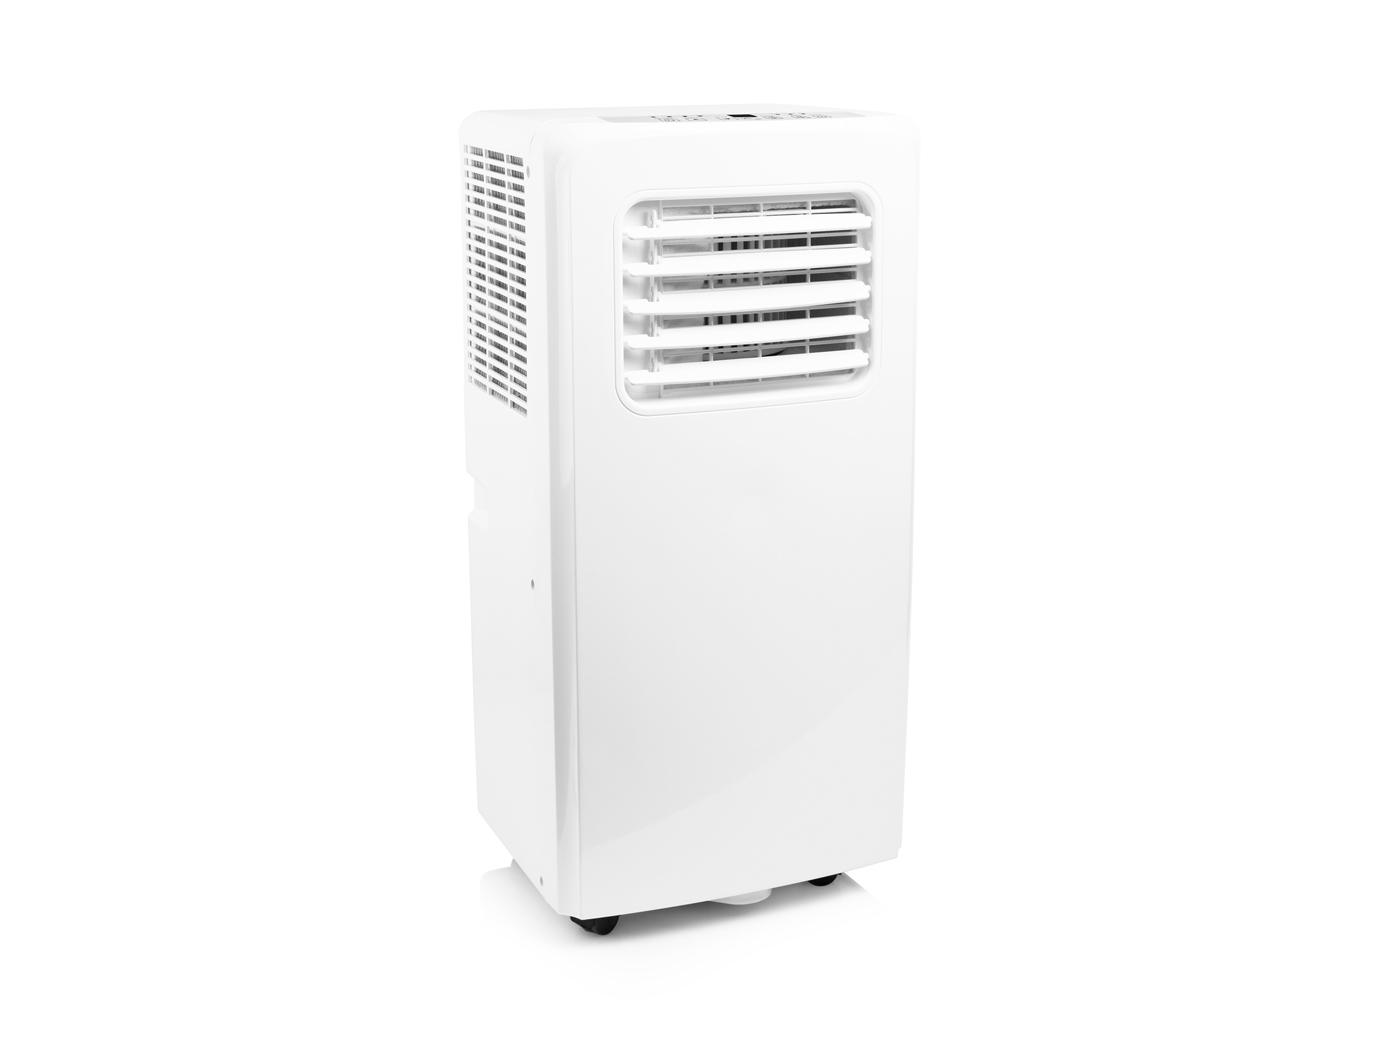 Lokales Klimagerät 3 Betriebsarten Eek A 3 0 Kw Mobile Klimaanlage